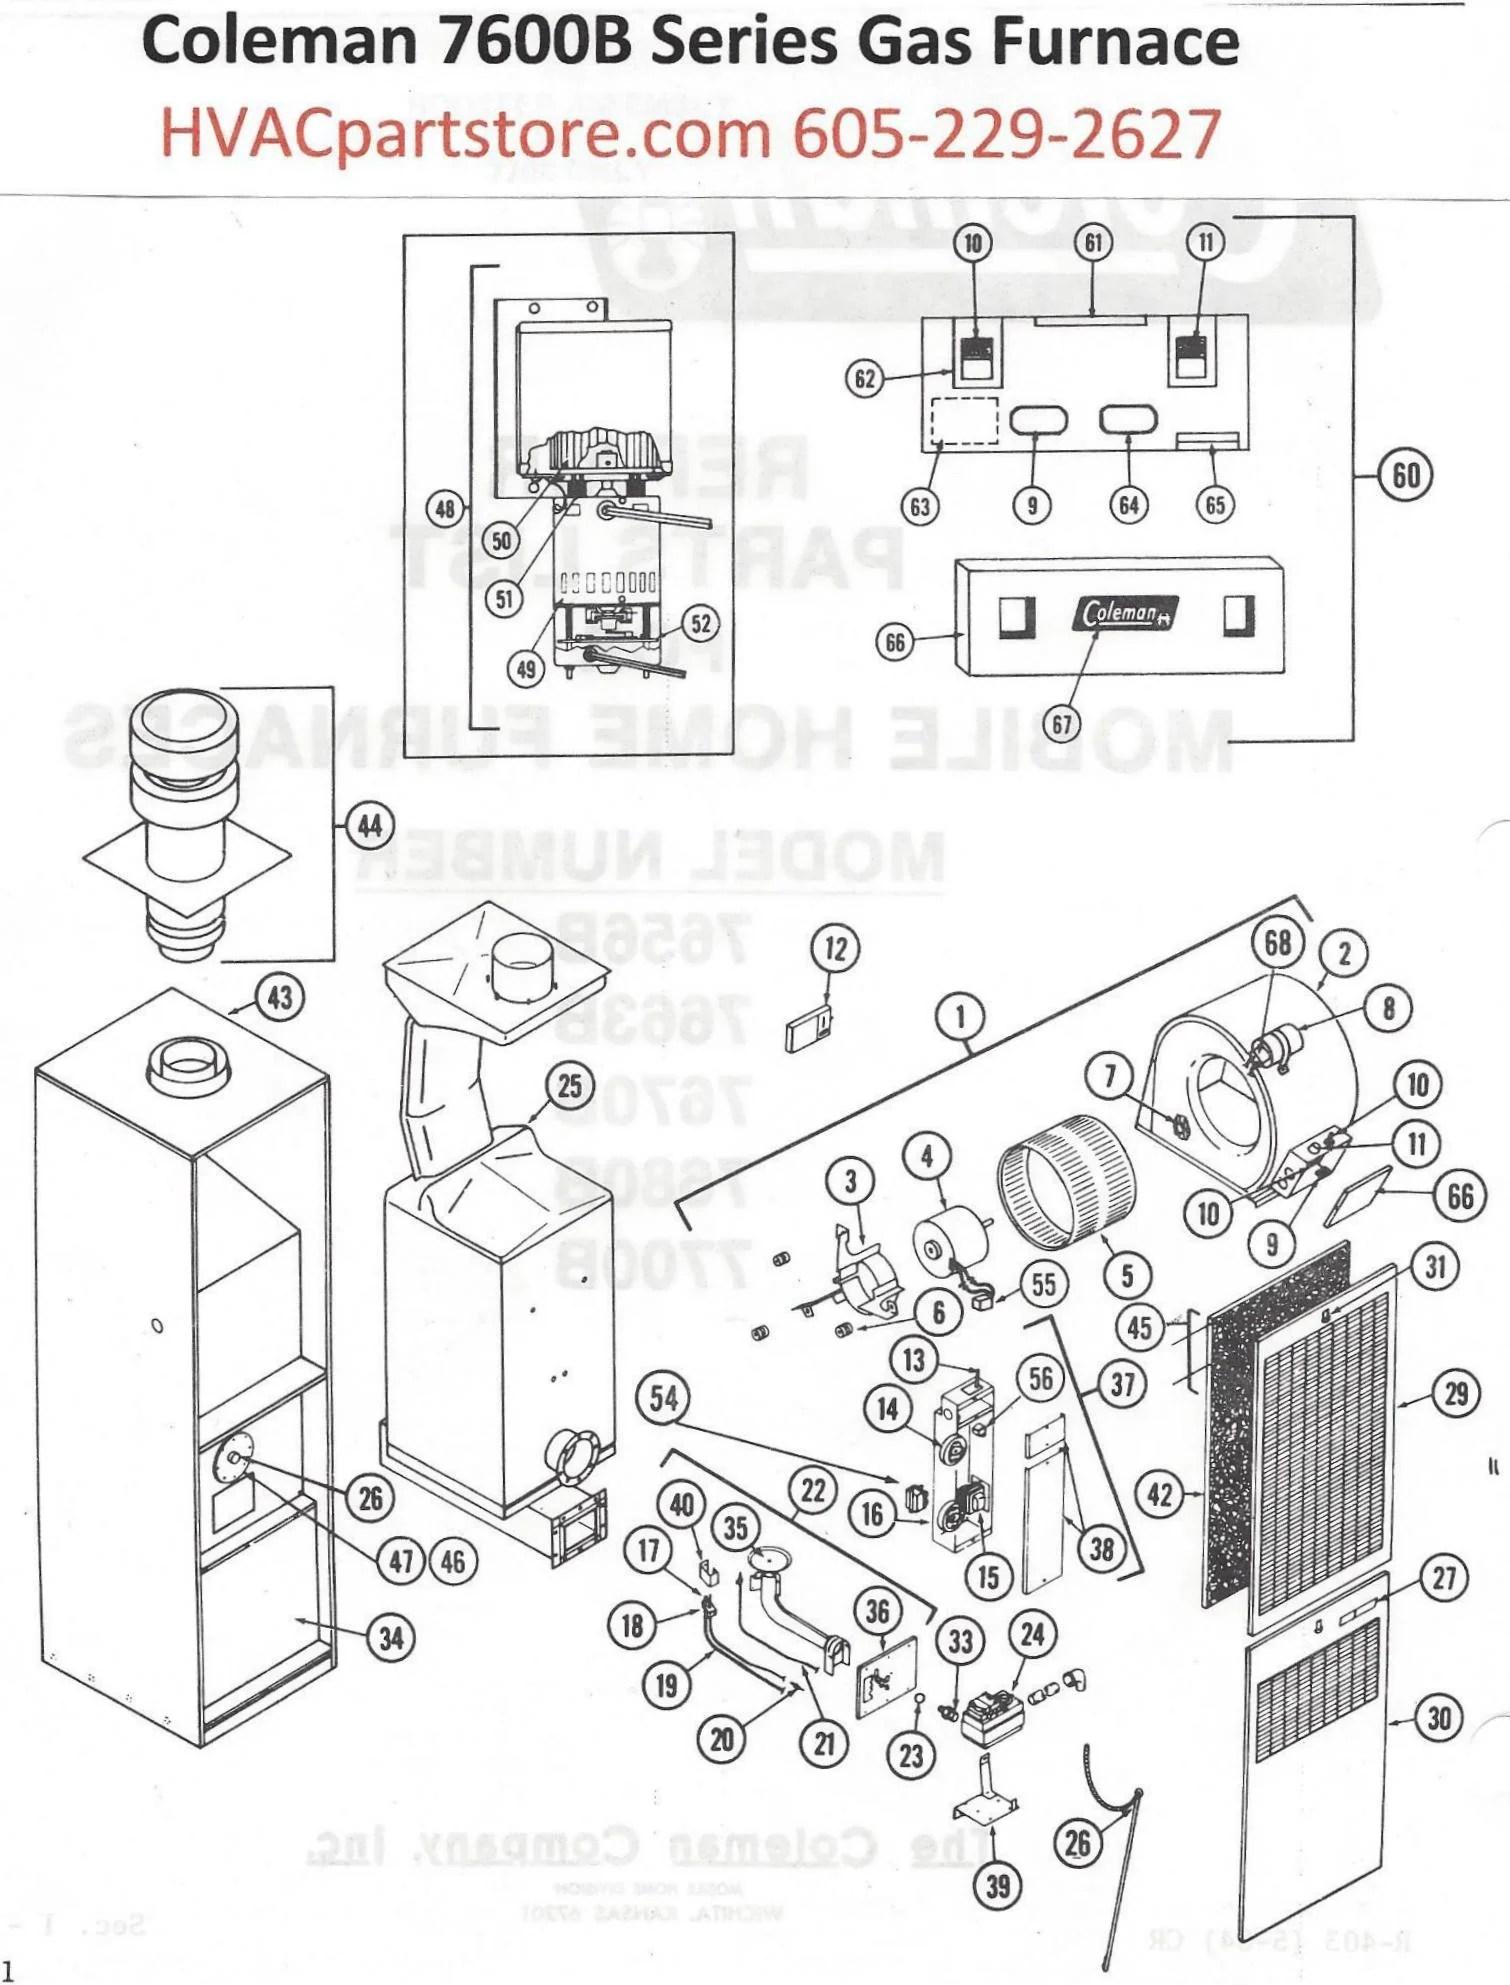 medium resolution of 7656b856 coleman gas furnace parts